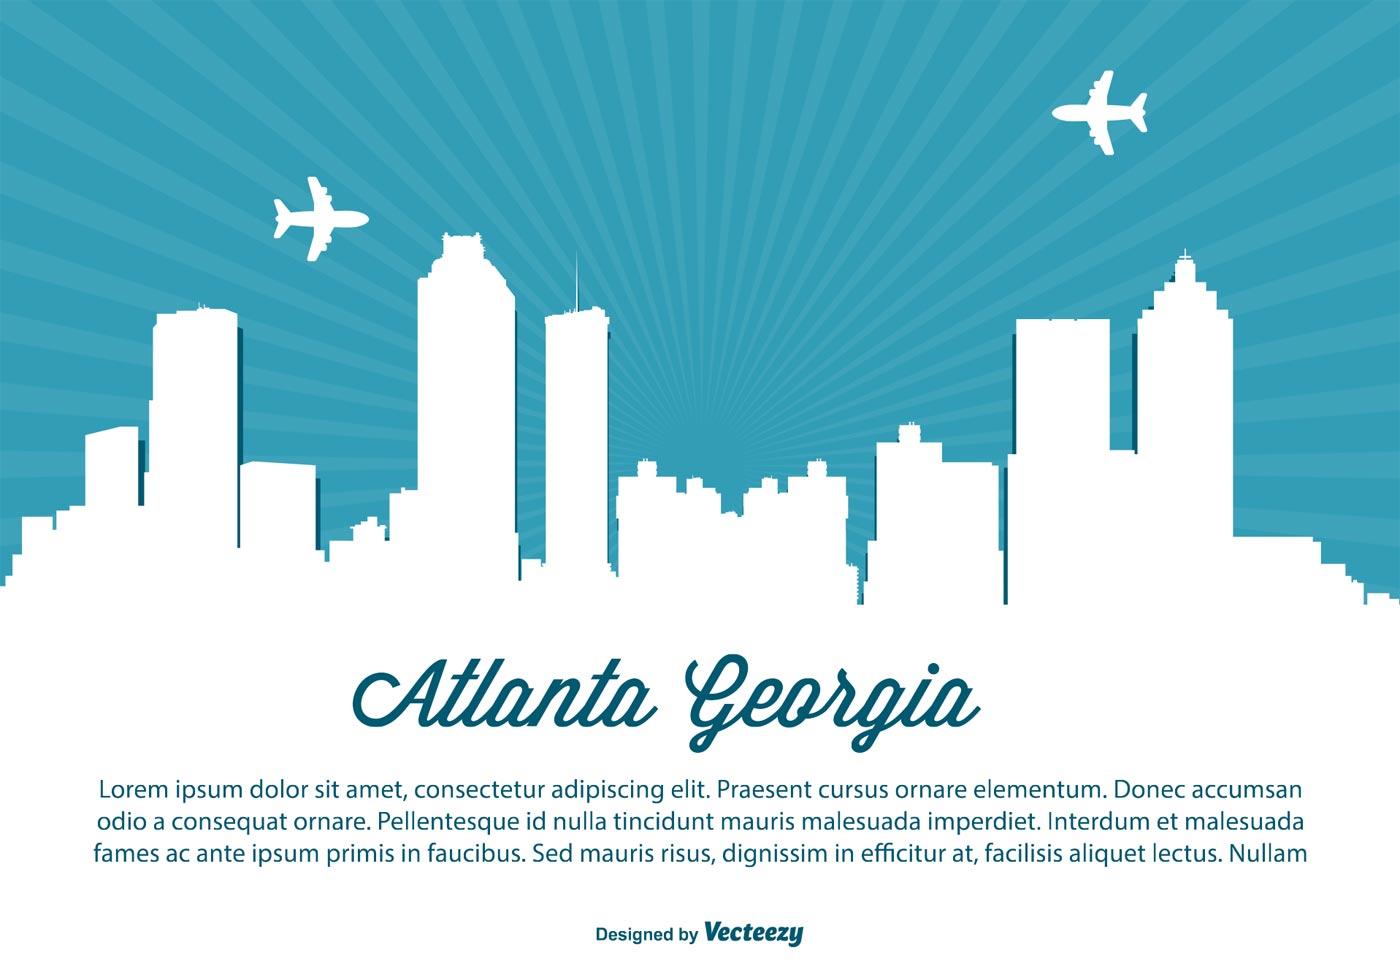 atlanta georgia skyline illustration download free Chicago Skyline Vector Boston City Skyline